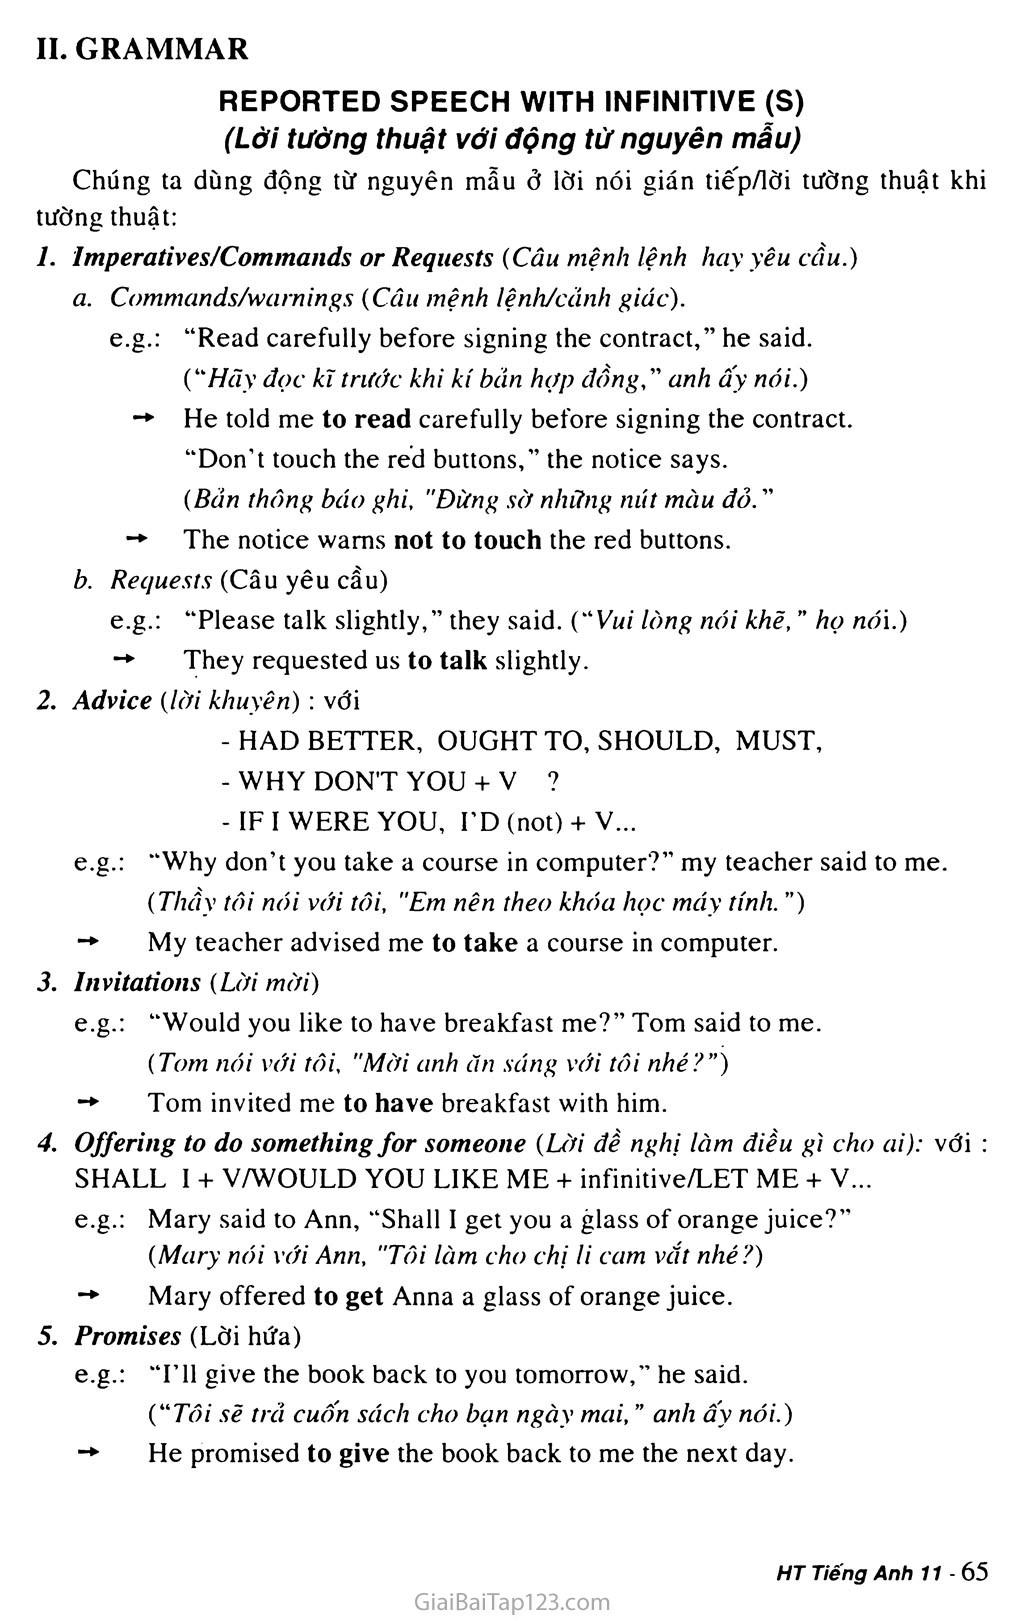 Unit 5: ILLITERACY trang 4